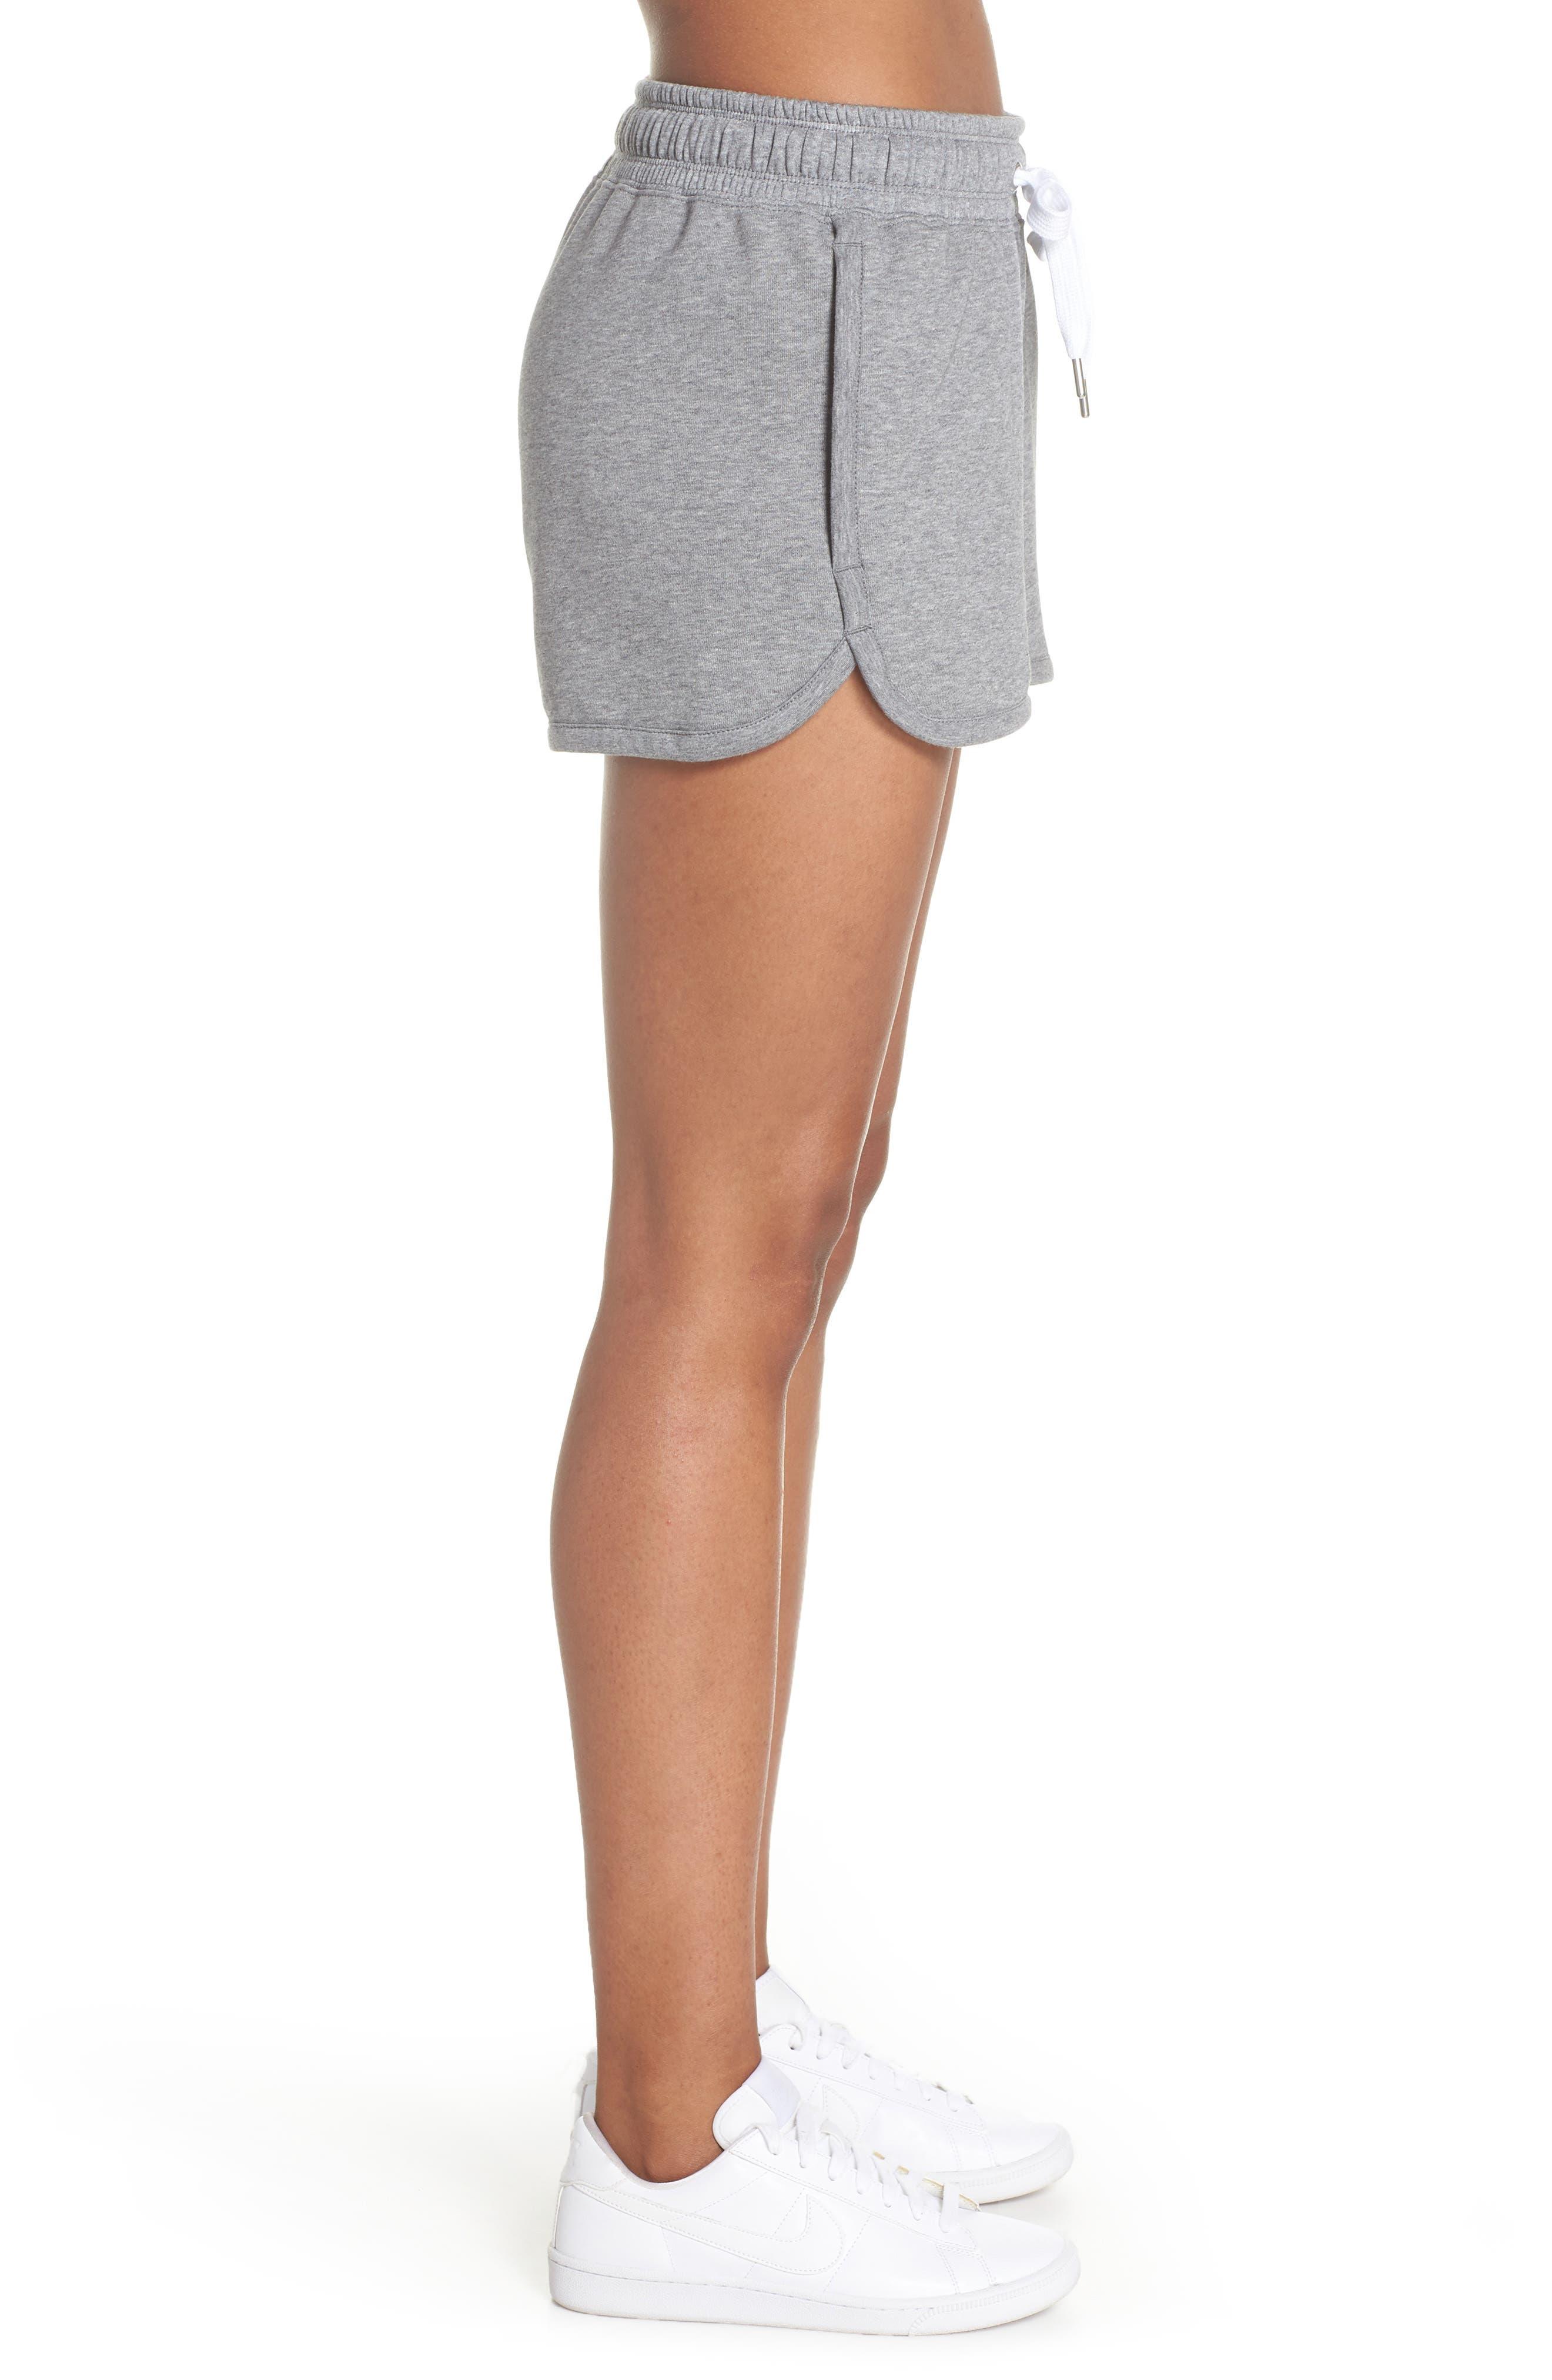 Sportswear Air Gym Shorts,                             Alternate thumbnail 3, color,                             Carbon Heather/ White/ Black